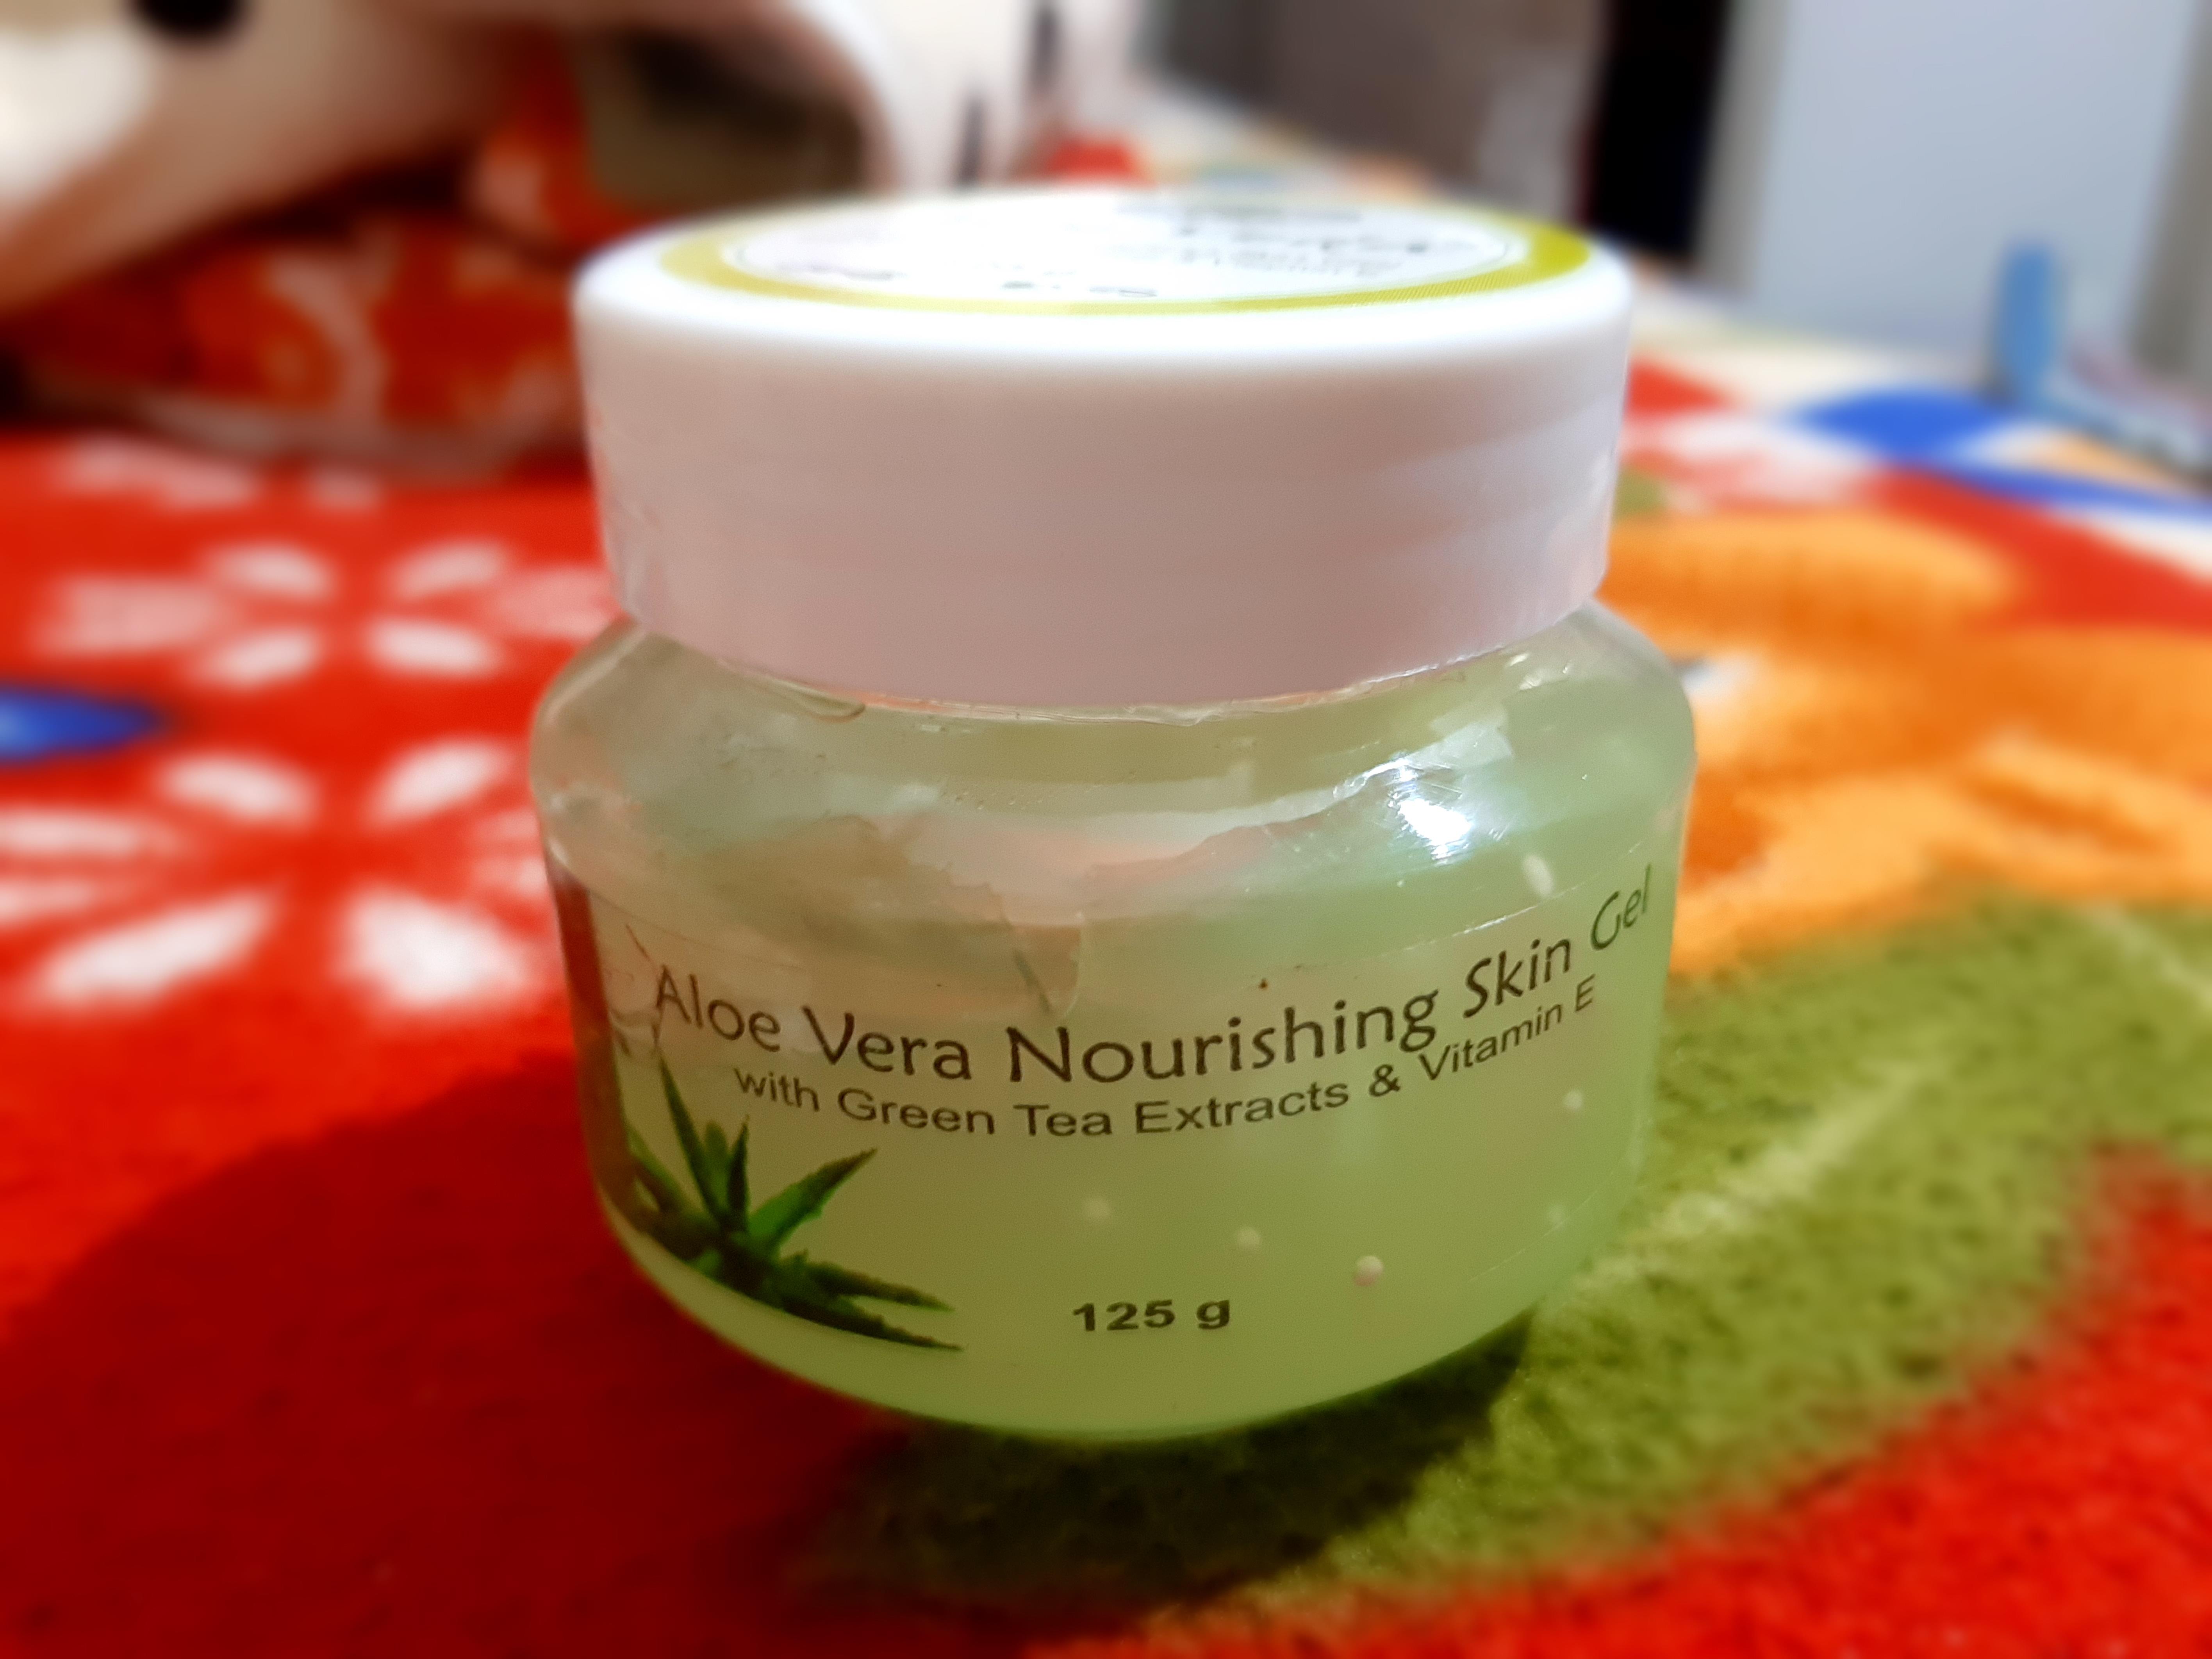 Aloe Veda Aloe Vera Nourishing Skin Gel With Green Tea Extracts & Vitamin E-Multi Use Aloe Vera Gel-By kusum_jain